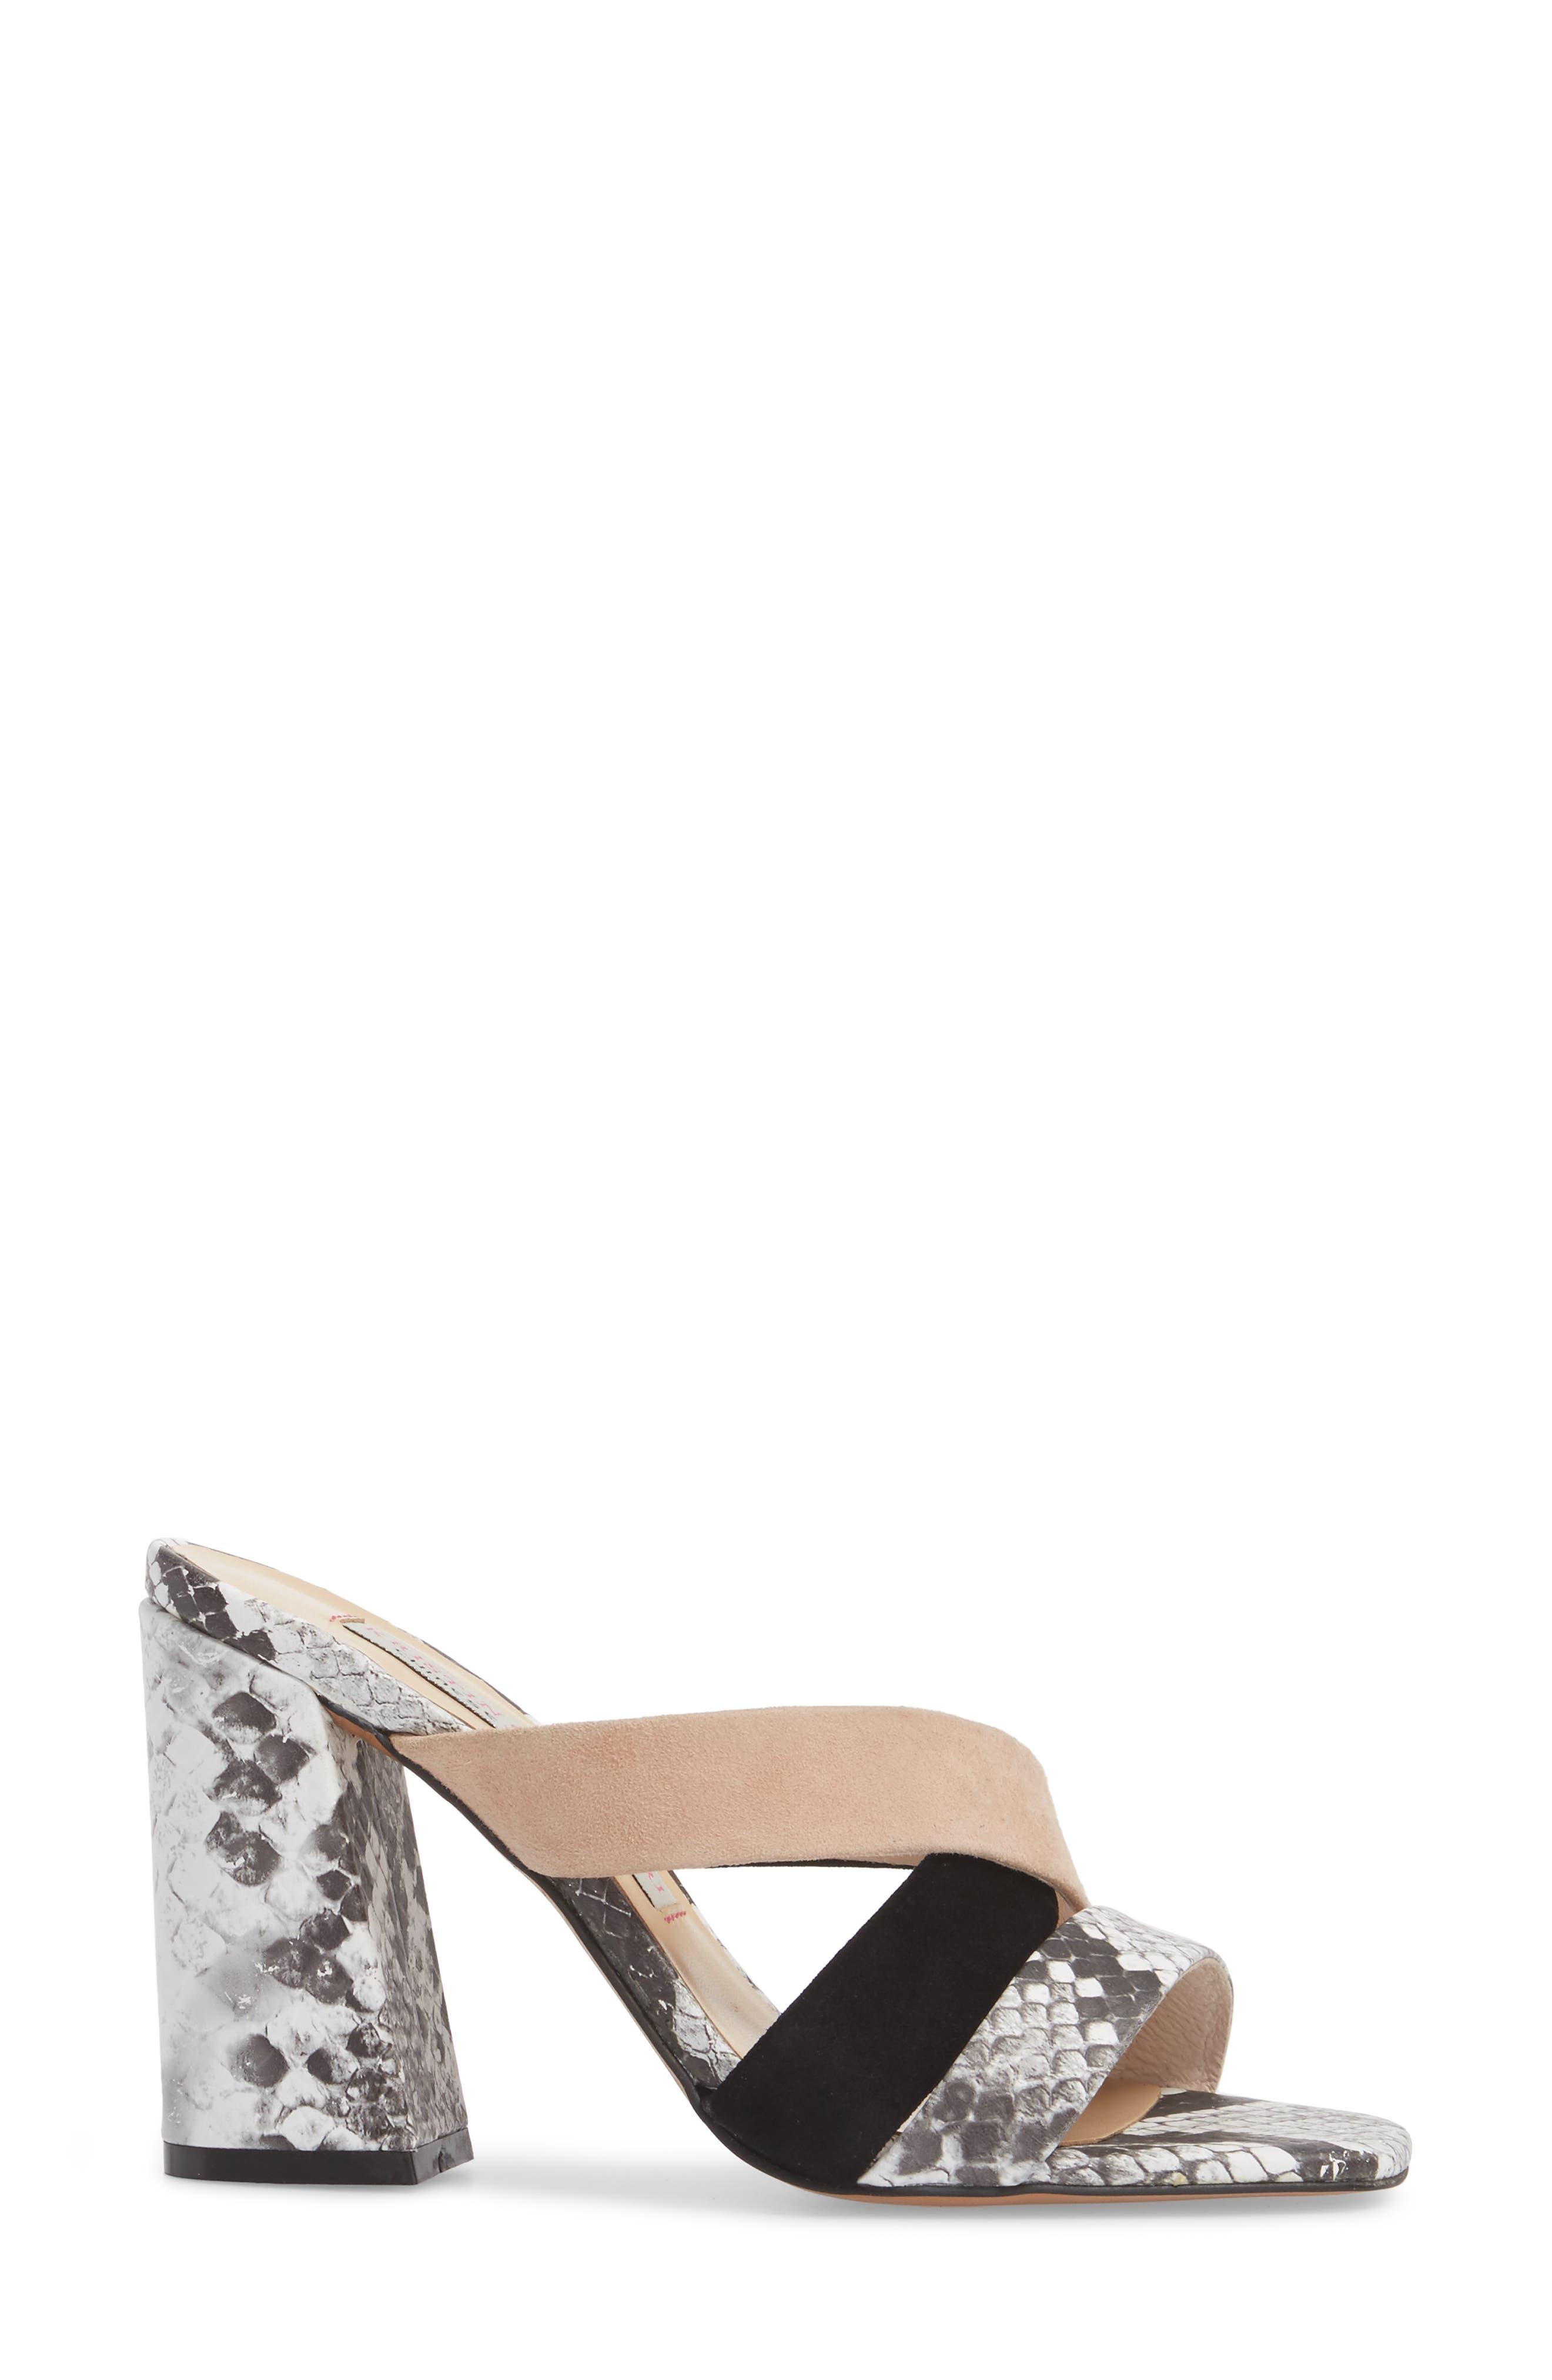 Lola Slide Sandal,                             Alternate thumbnail 3, color,                             Grey/ White Print Leather